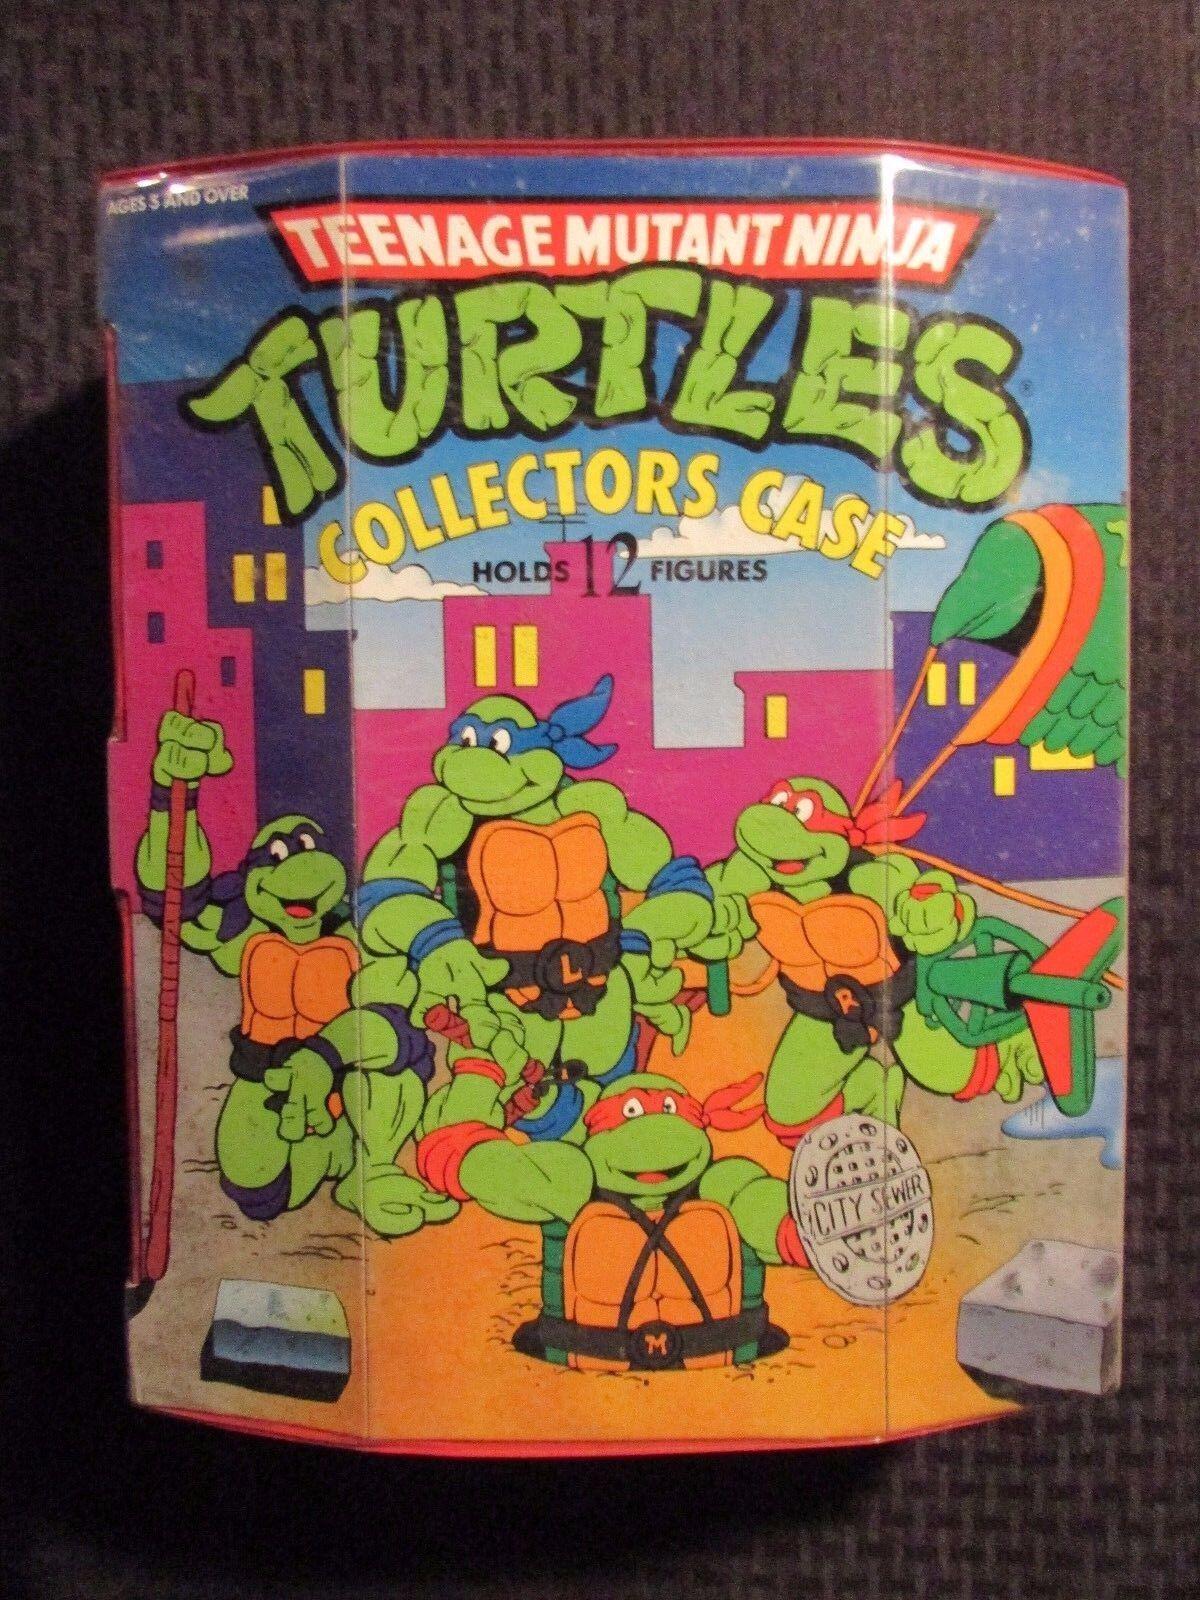 1991 TEENAGE MUTANT NINJA TURTLES Collectors Case w/ 9 Figures FN/FN+ TMNT